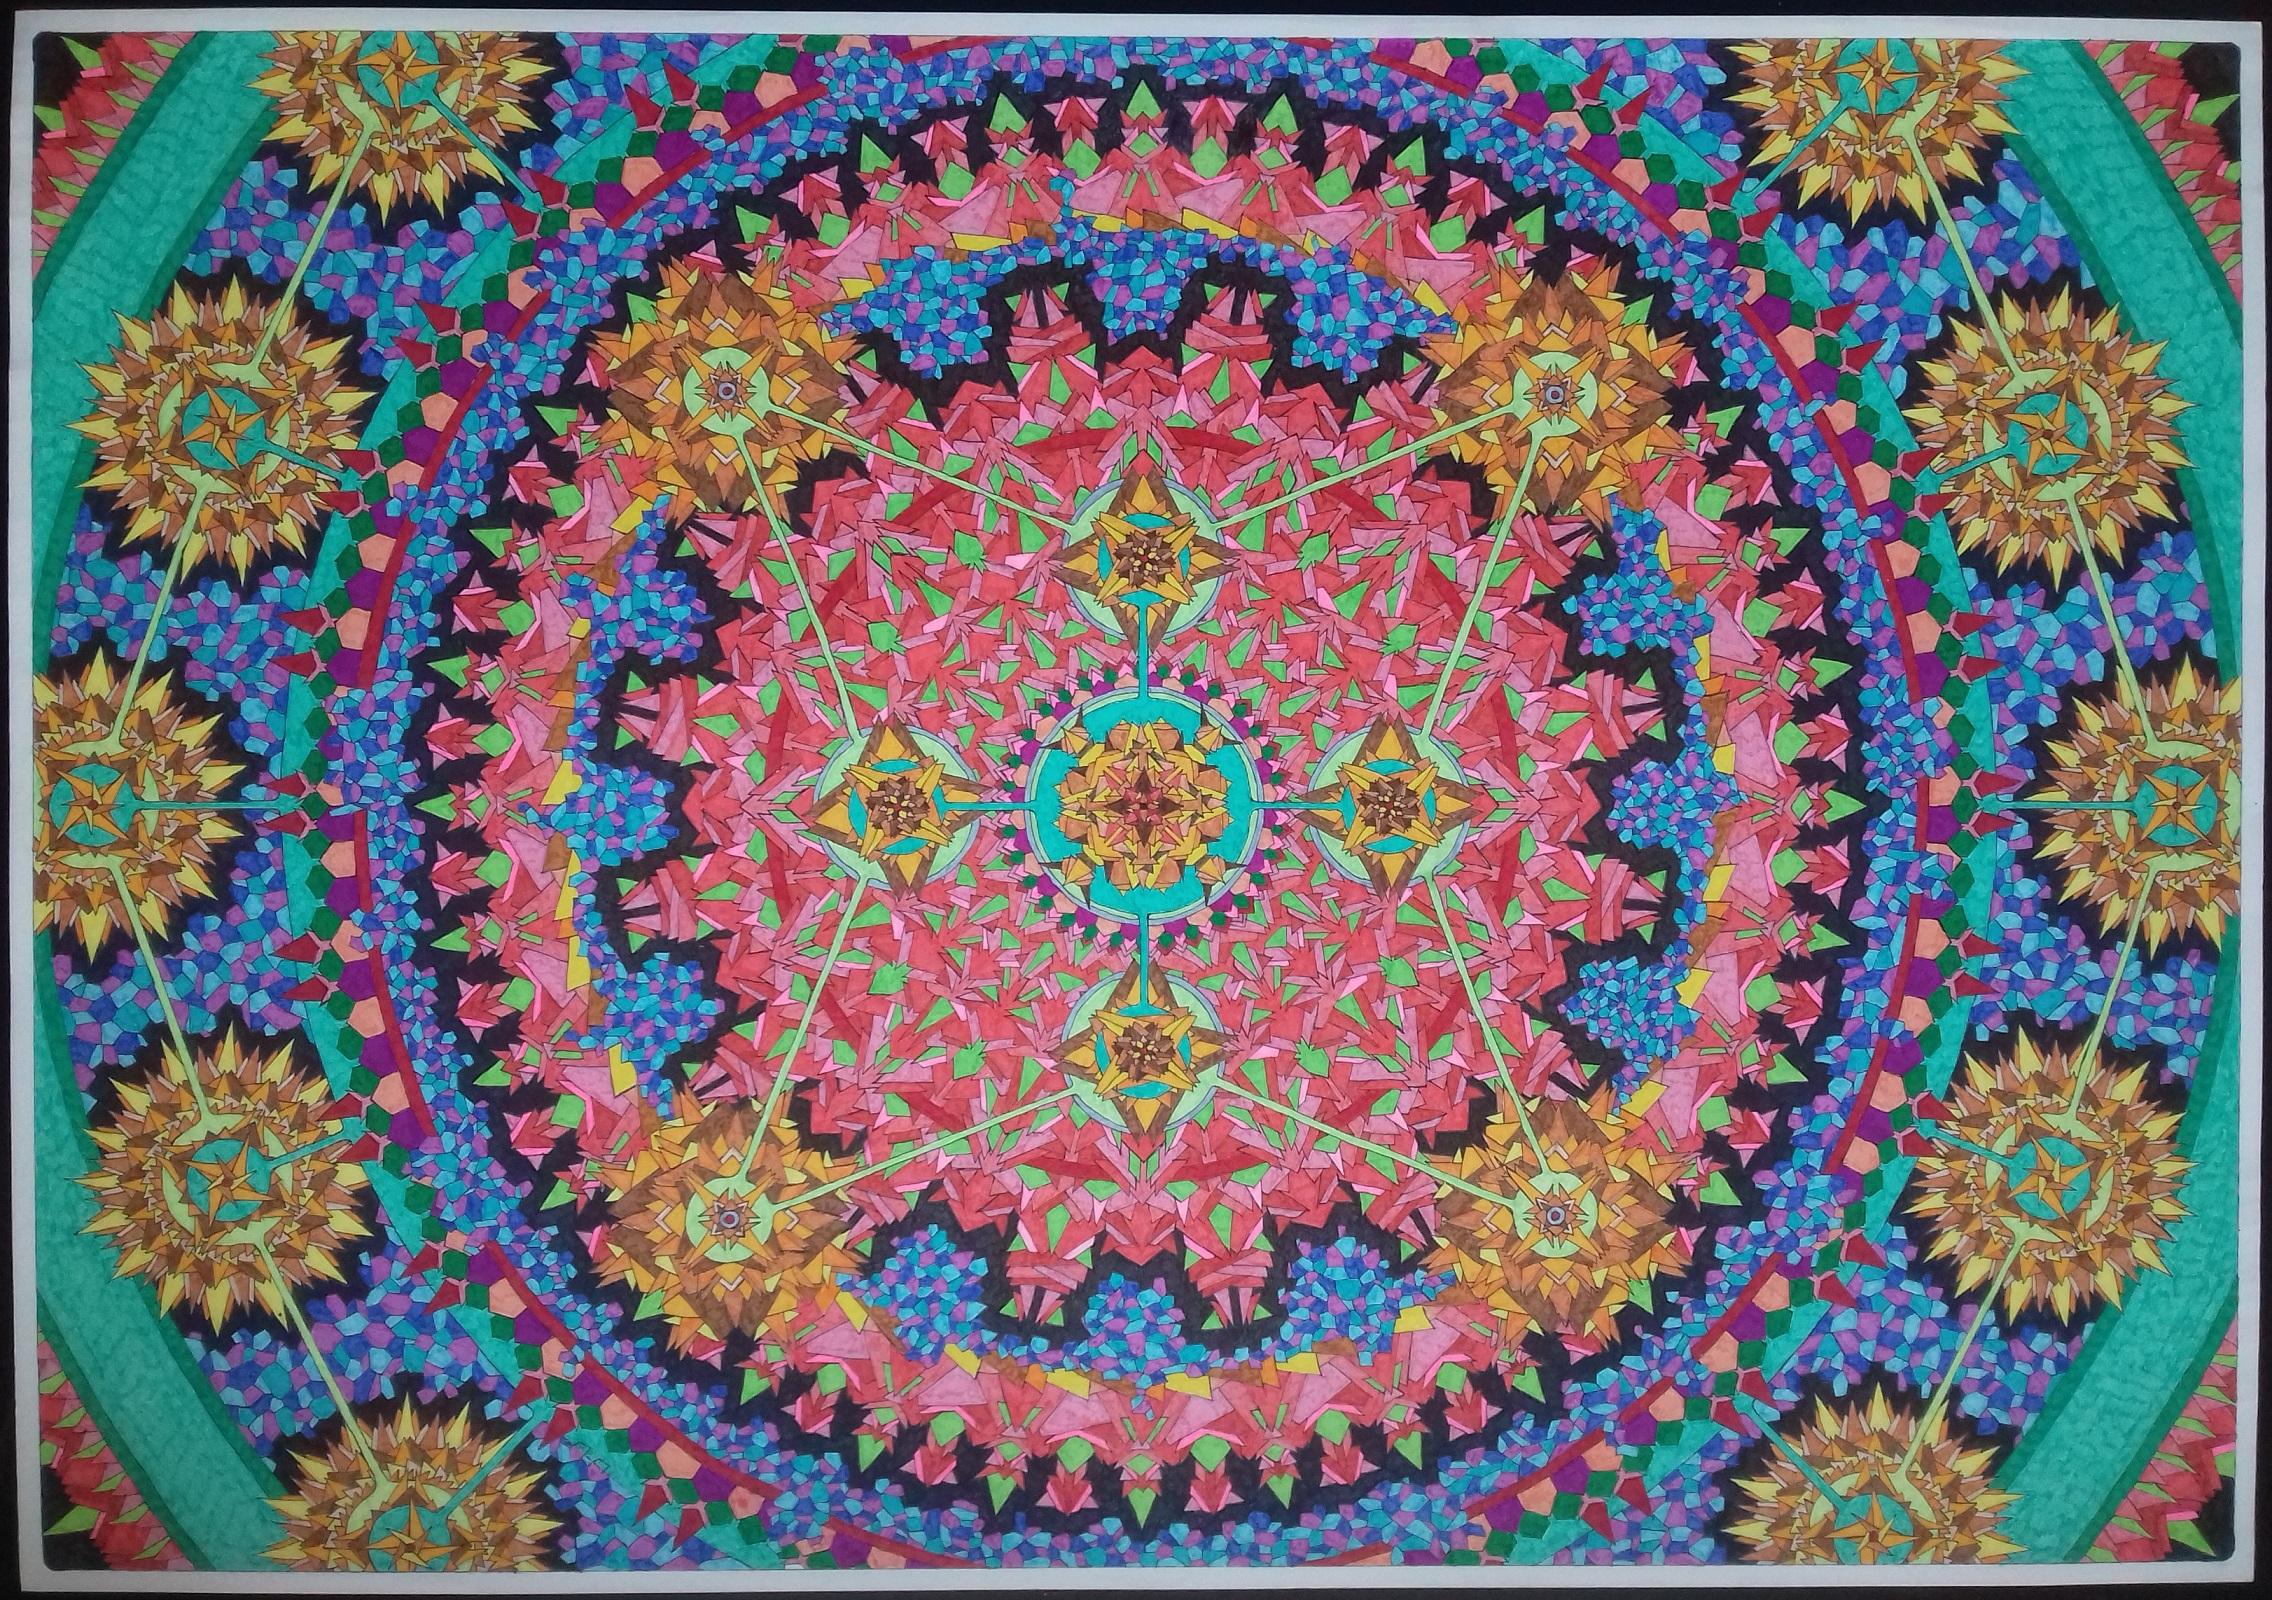 Solar artwork by Dafnis Rey - art listed for sale on Artplode